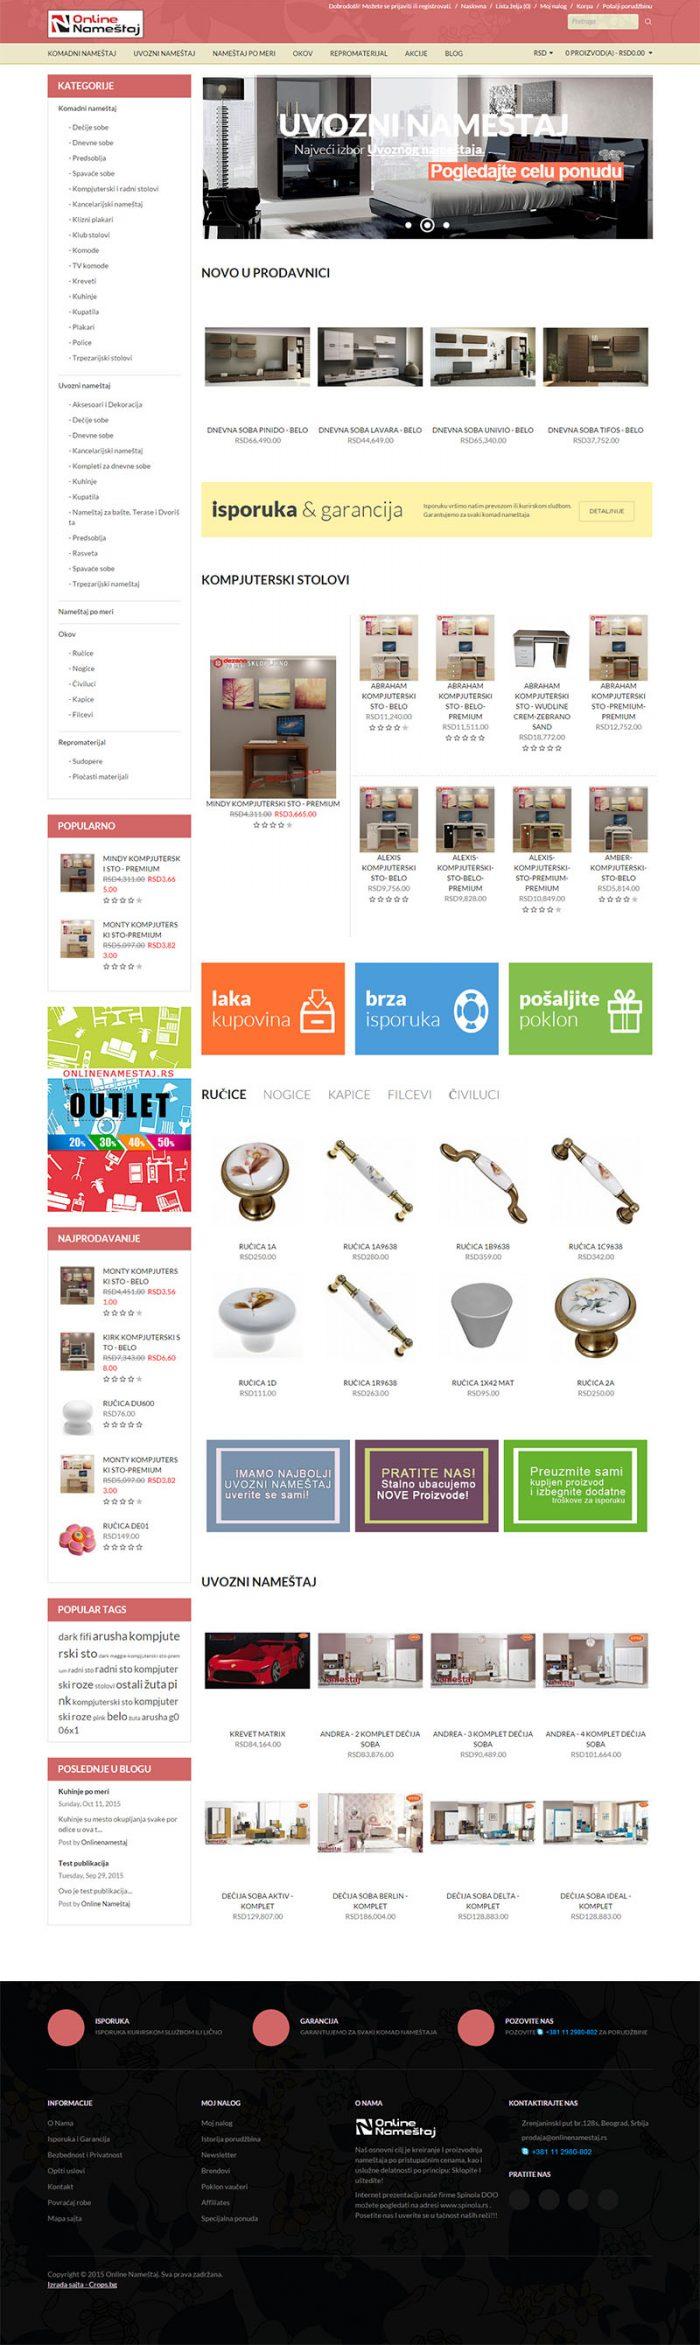 Интернет магазин за мебели, https://webnime.com